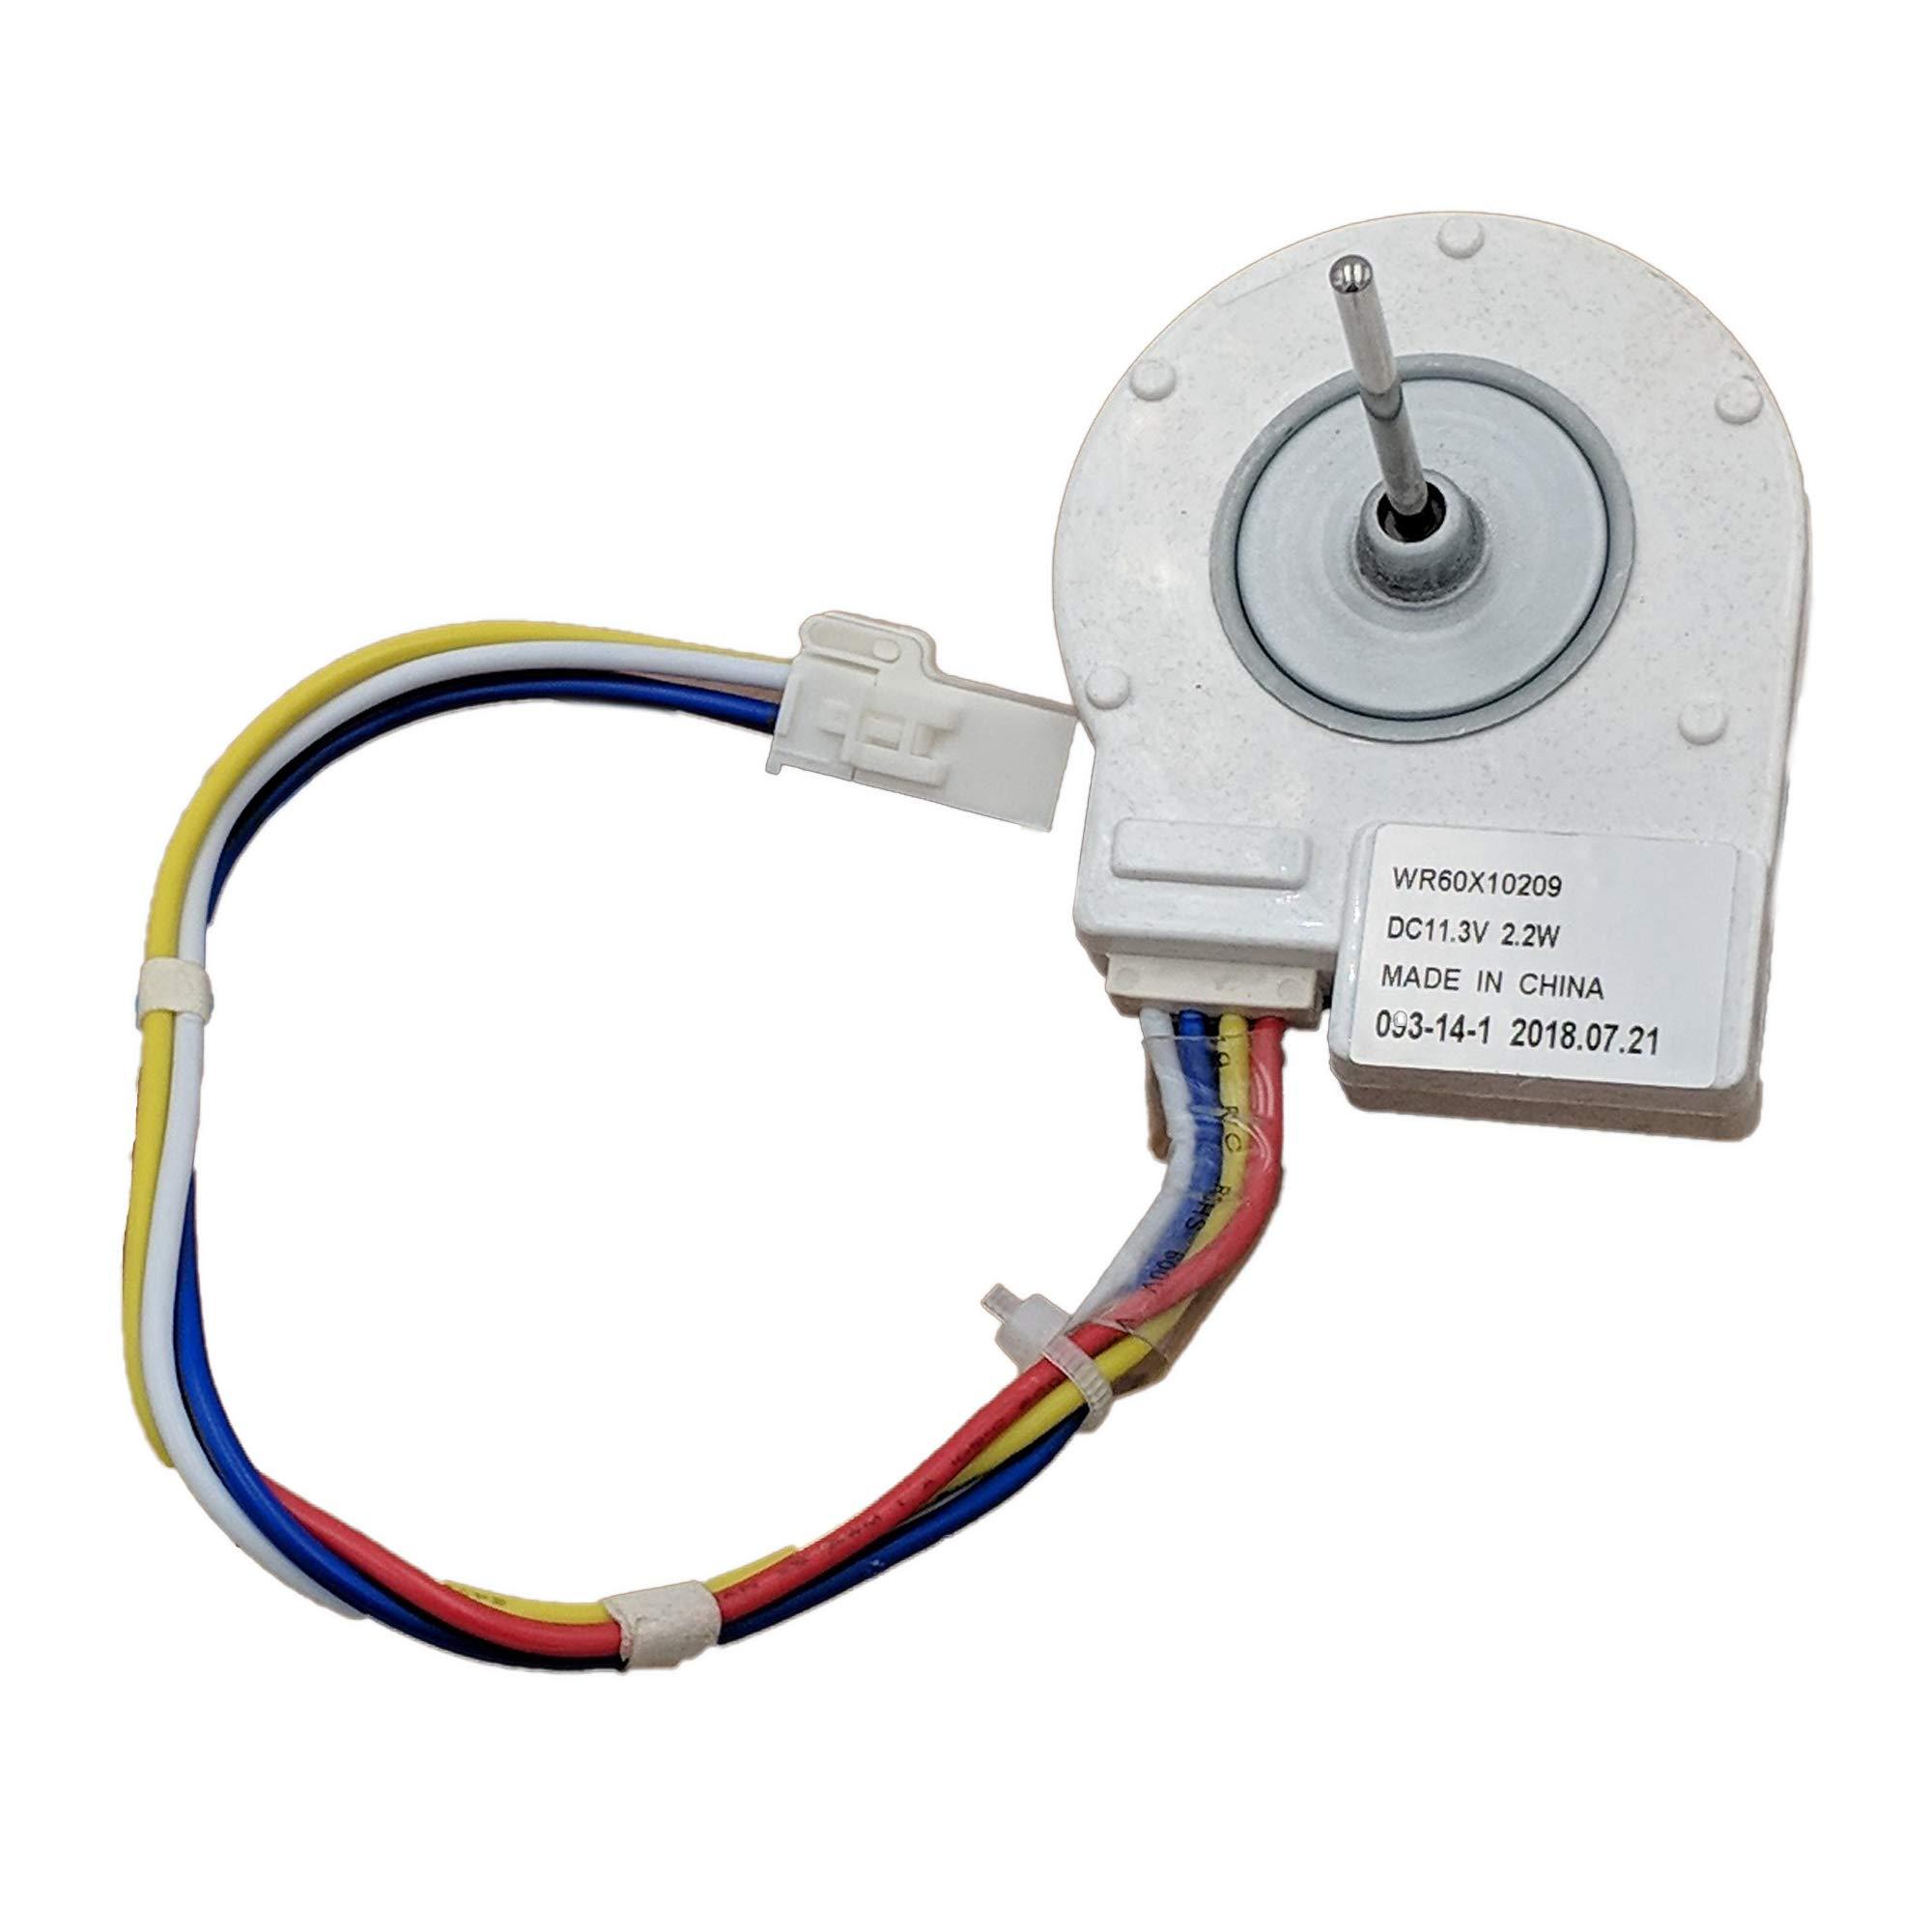 Supplying Demand WR60X10209 Refrigerator Condenser Fan Motor 12 Volt Fits WR60X10042